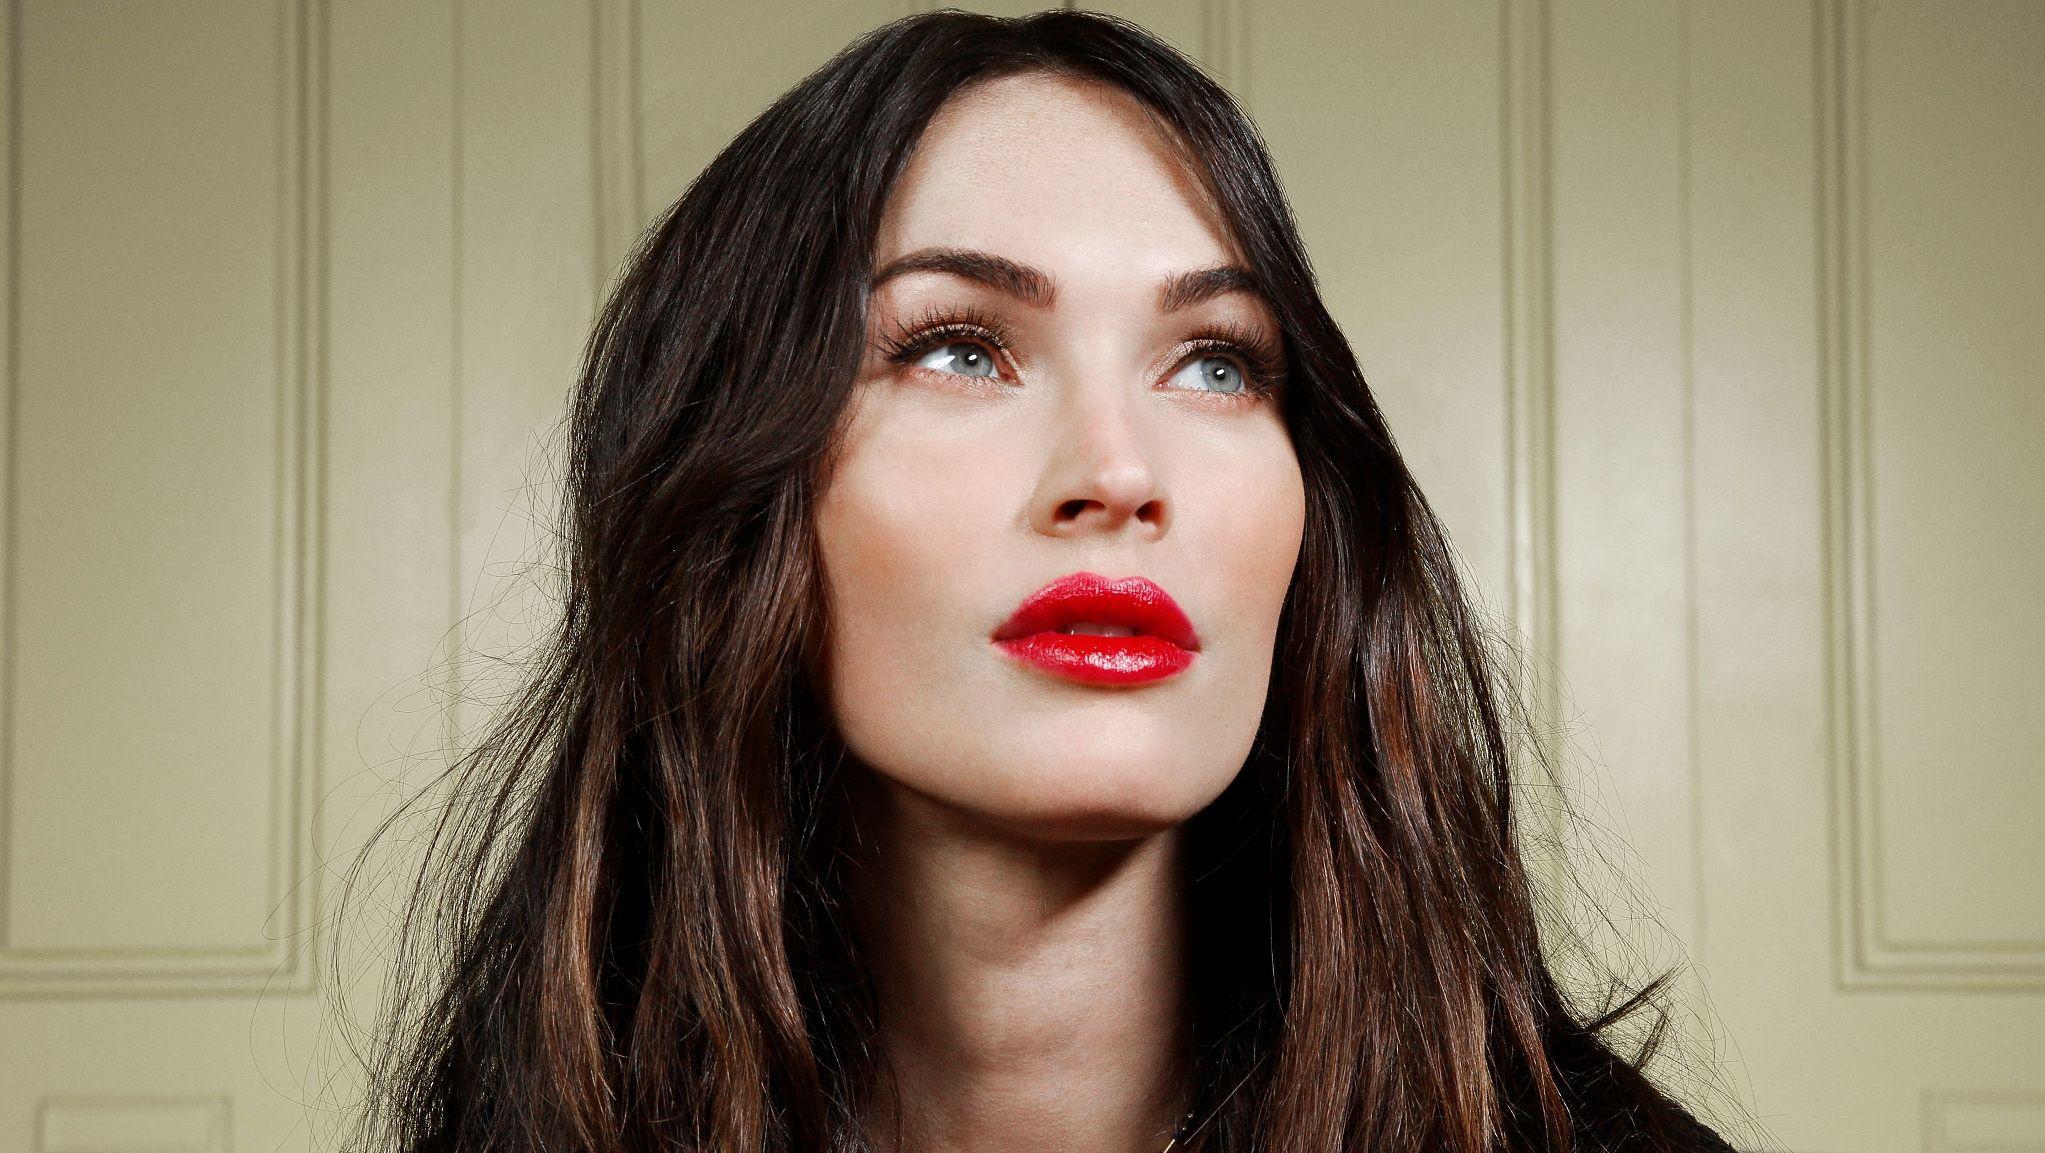 Меган Фокс: Актрисы, Brunette, Модели, American, Девушки, Меган Фокс